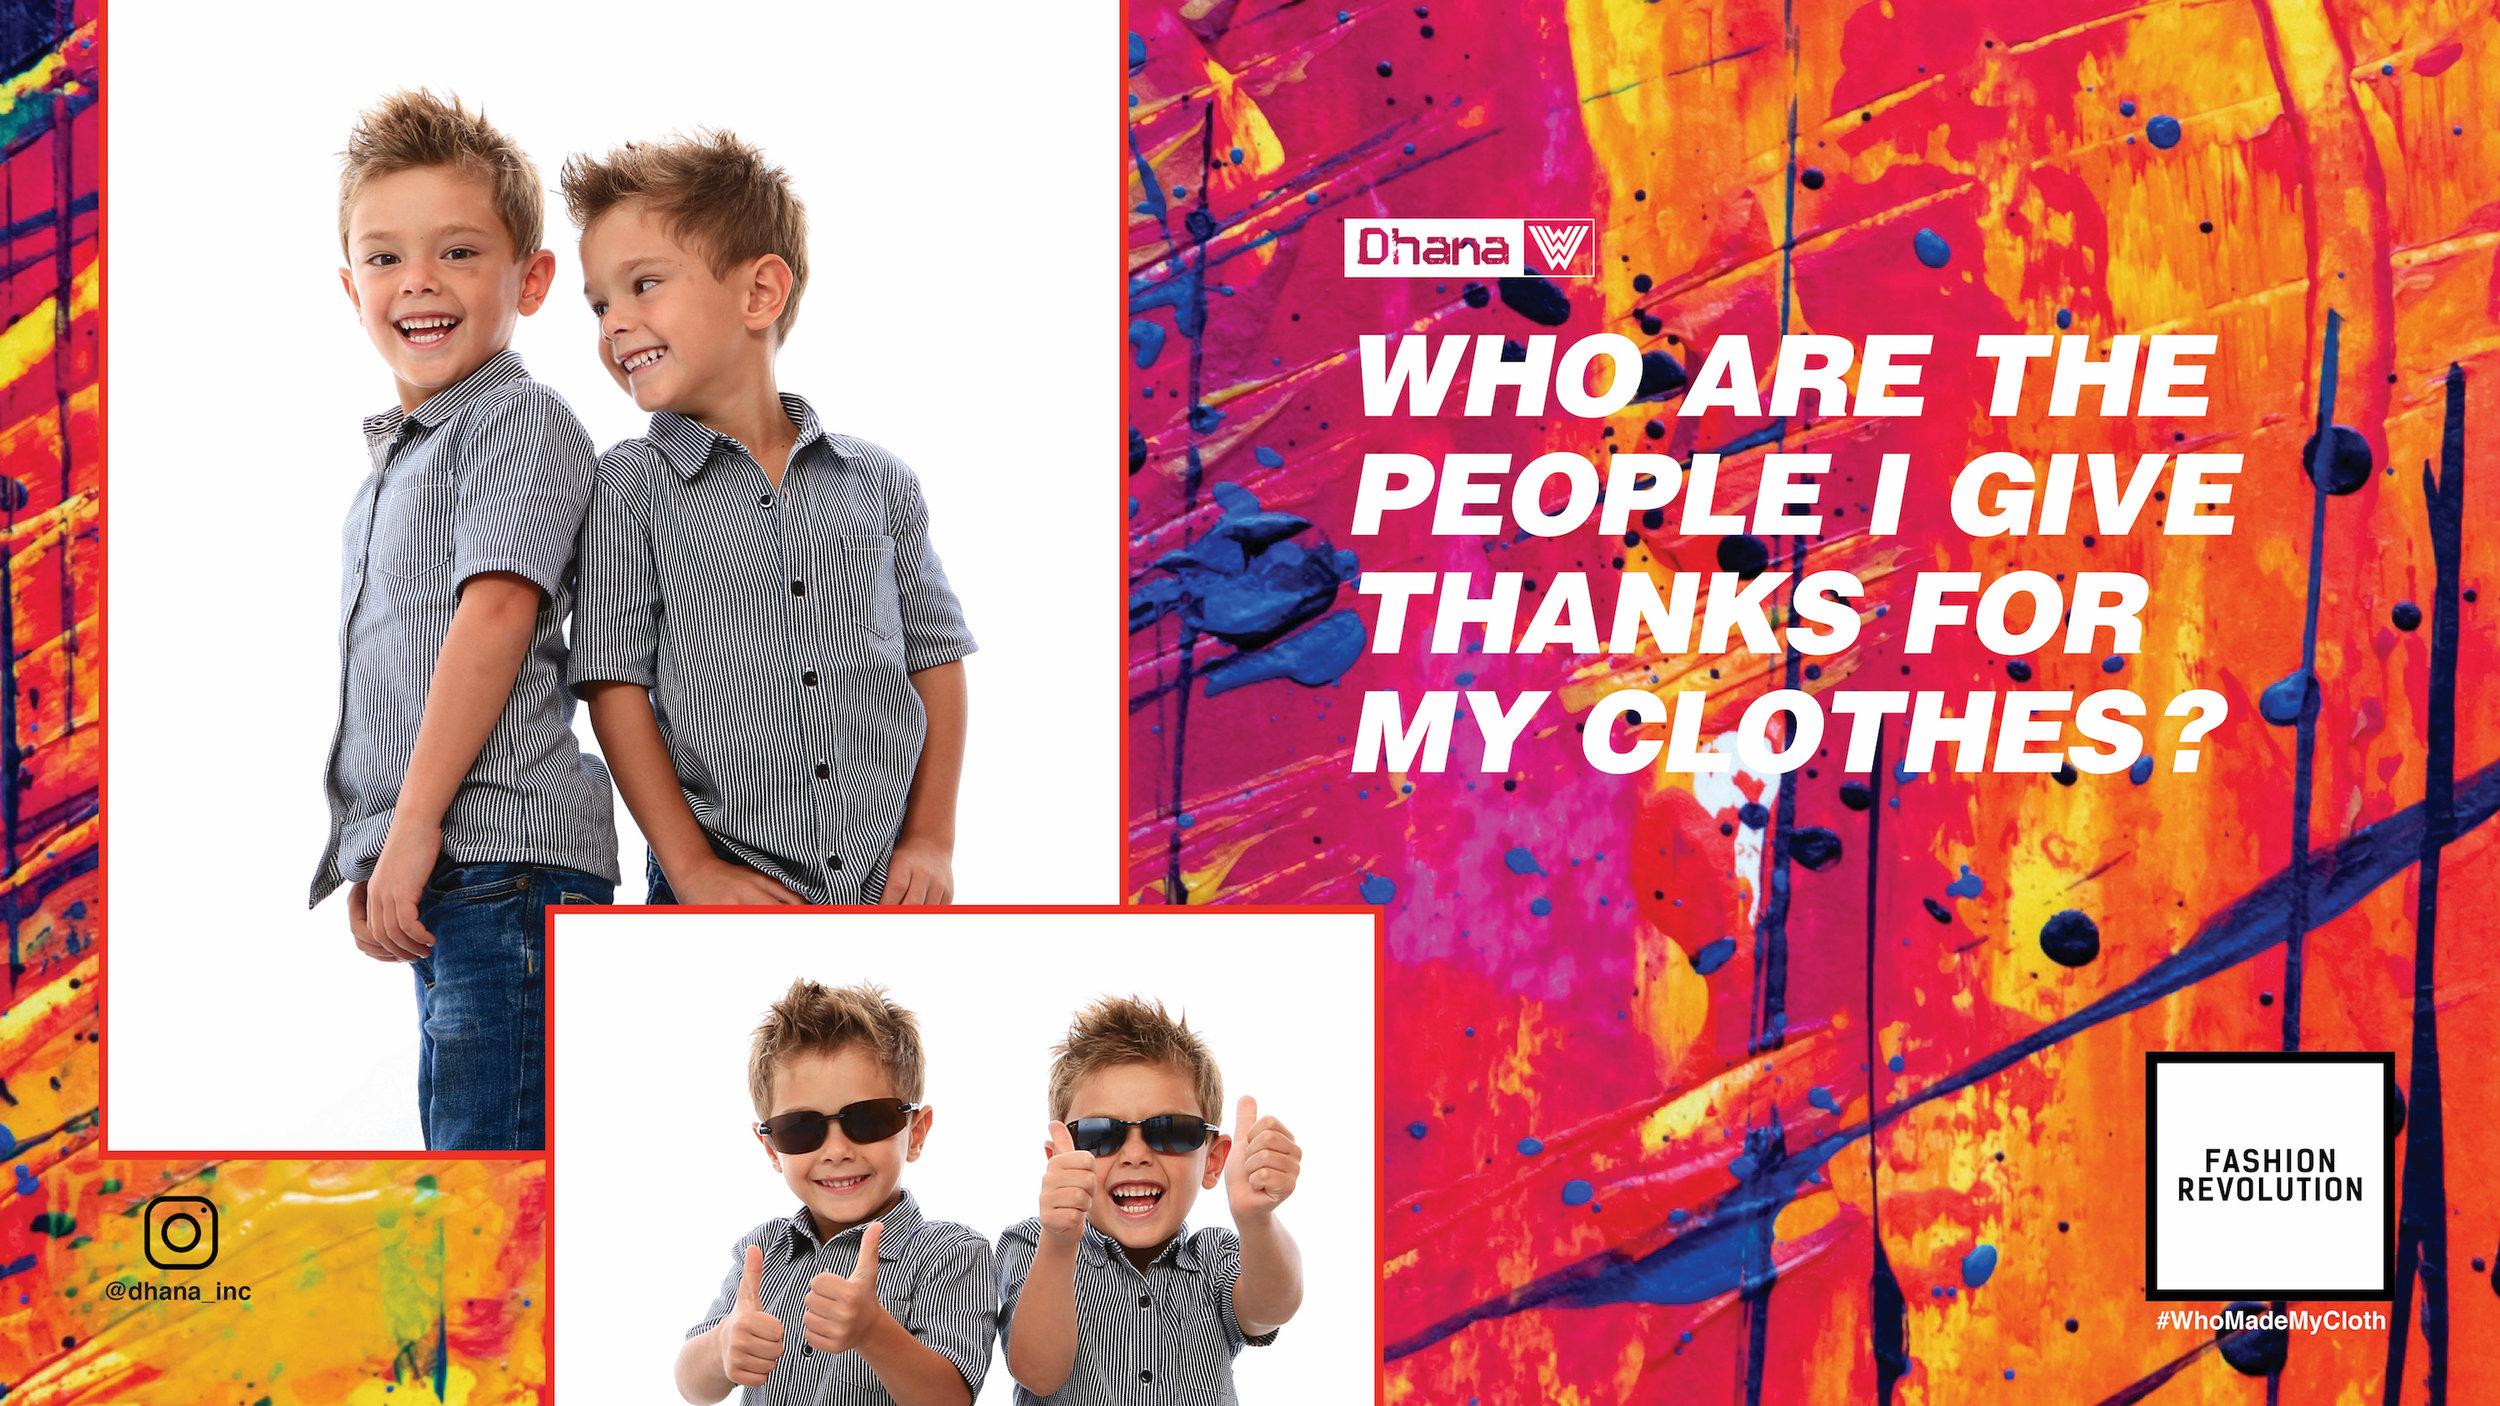 fashion revolution cover copy.jpg